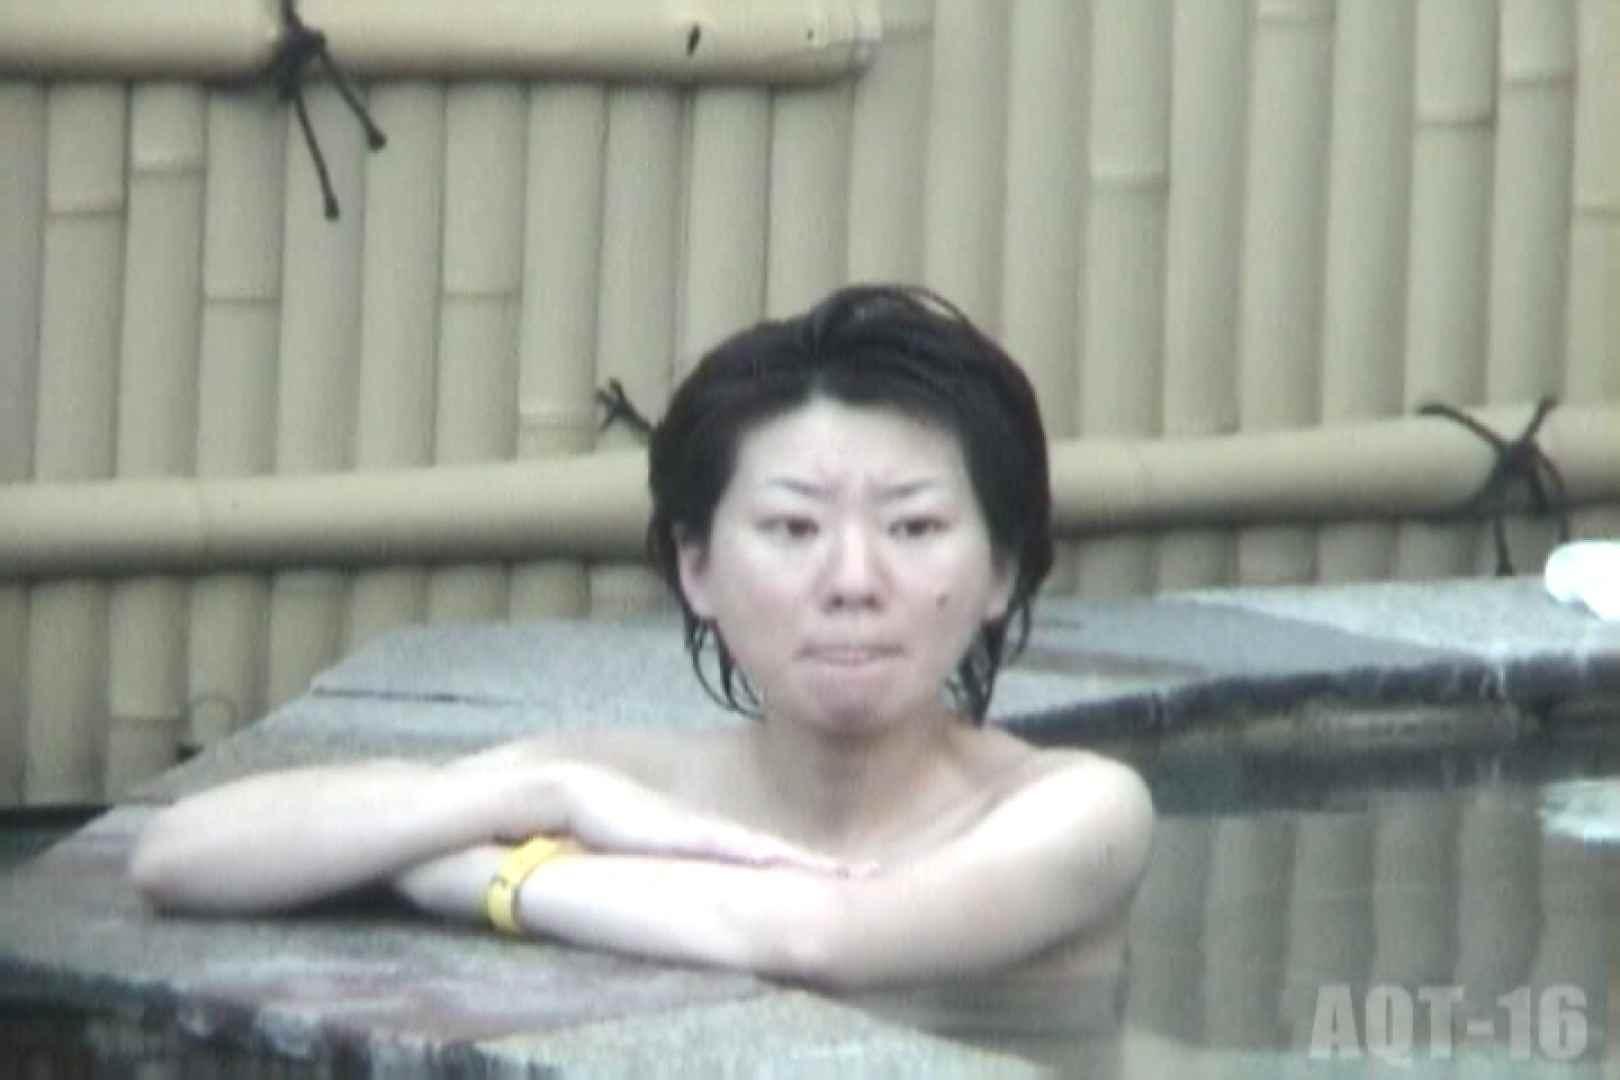 Aquaな露天風呂Vol.842 露天風呂編 | 盗撮シリーズ  82PIX 17